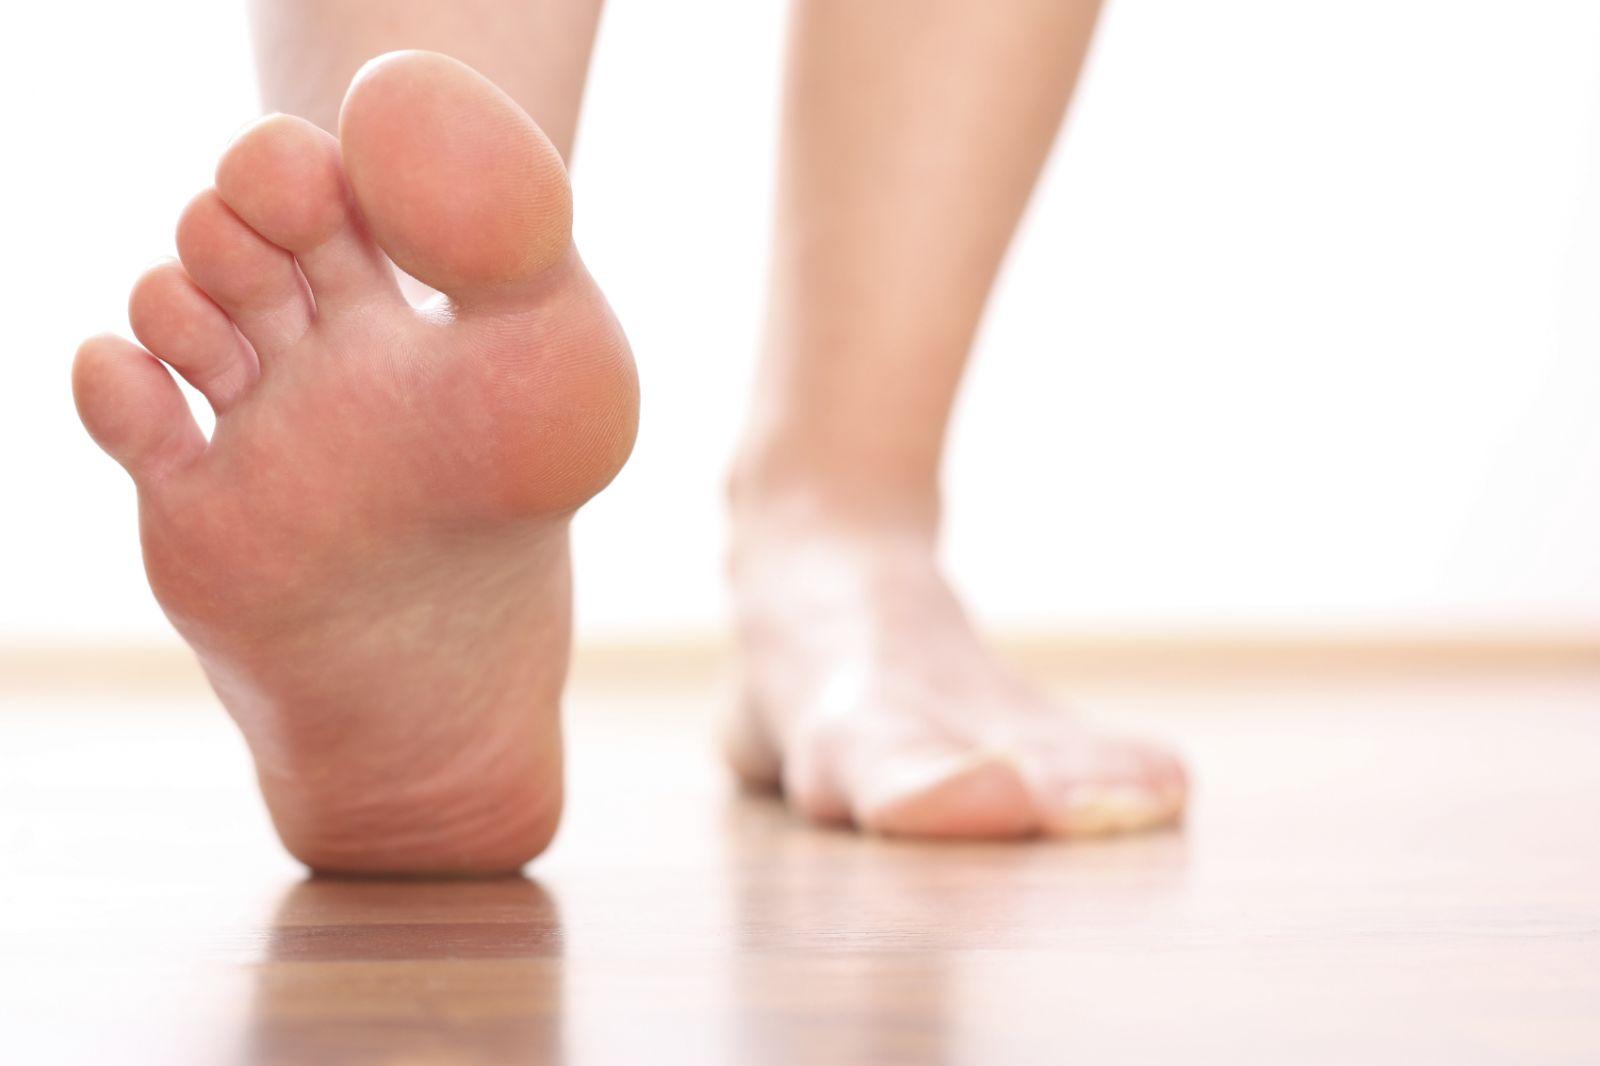 Foot care feet stretchistock 000019391753 medium